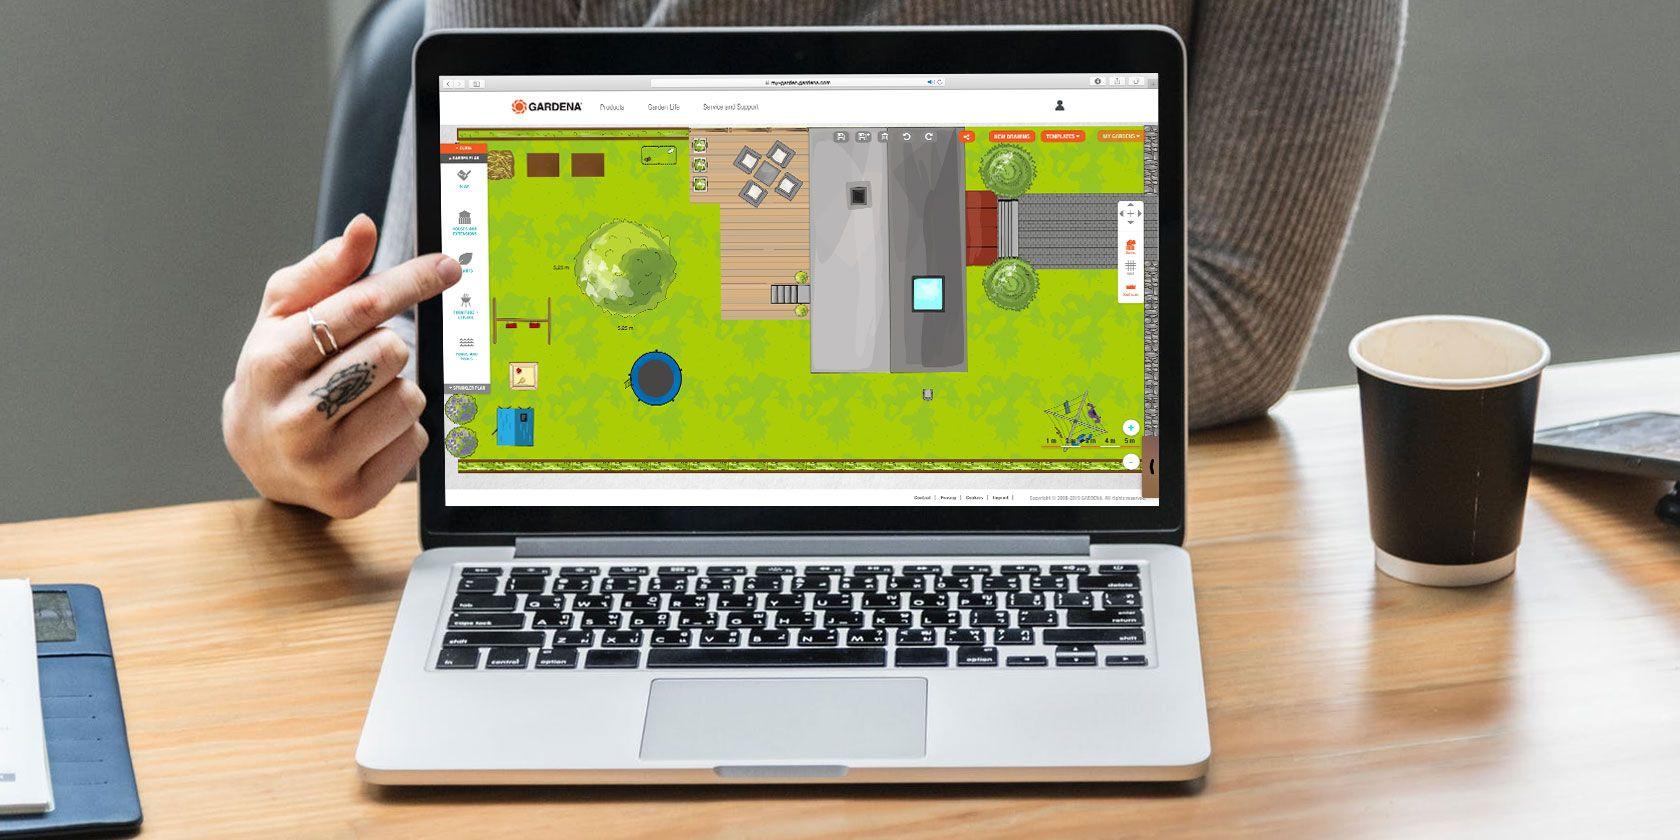 landscape-garden-design-tools